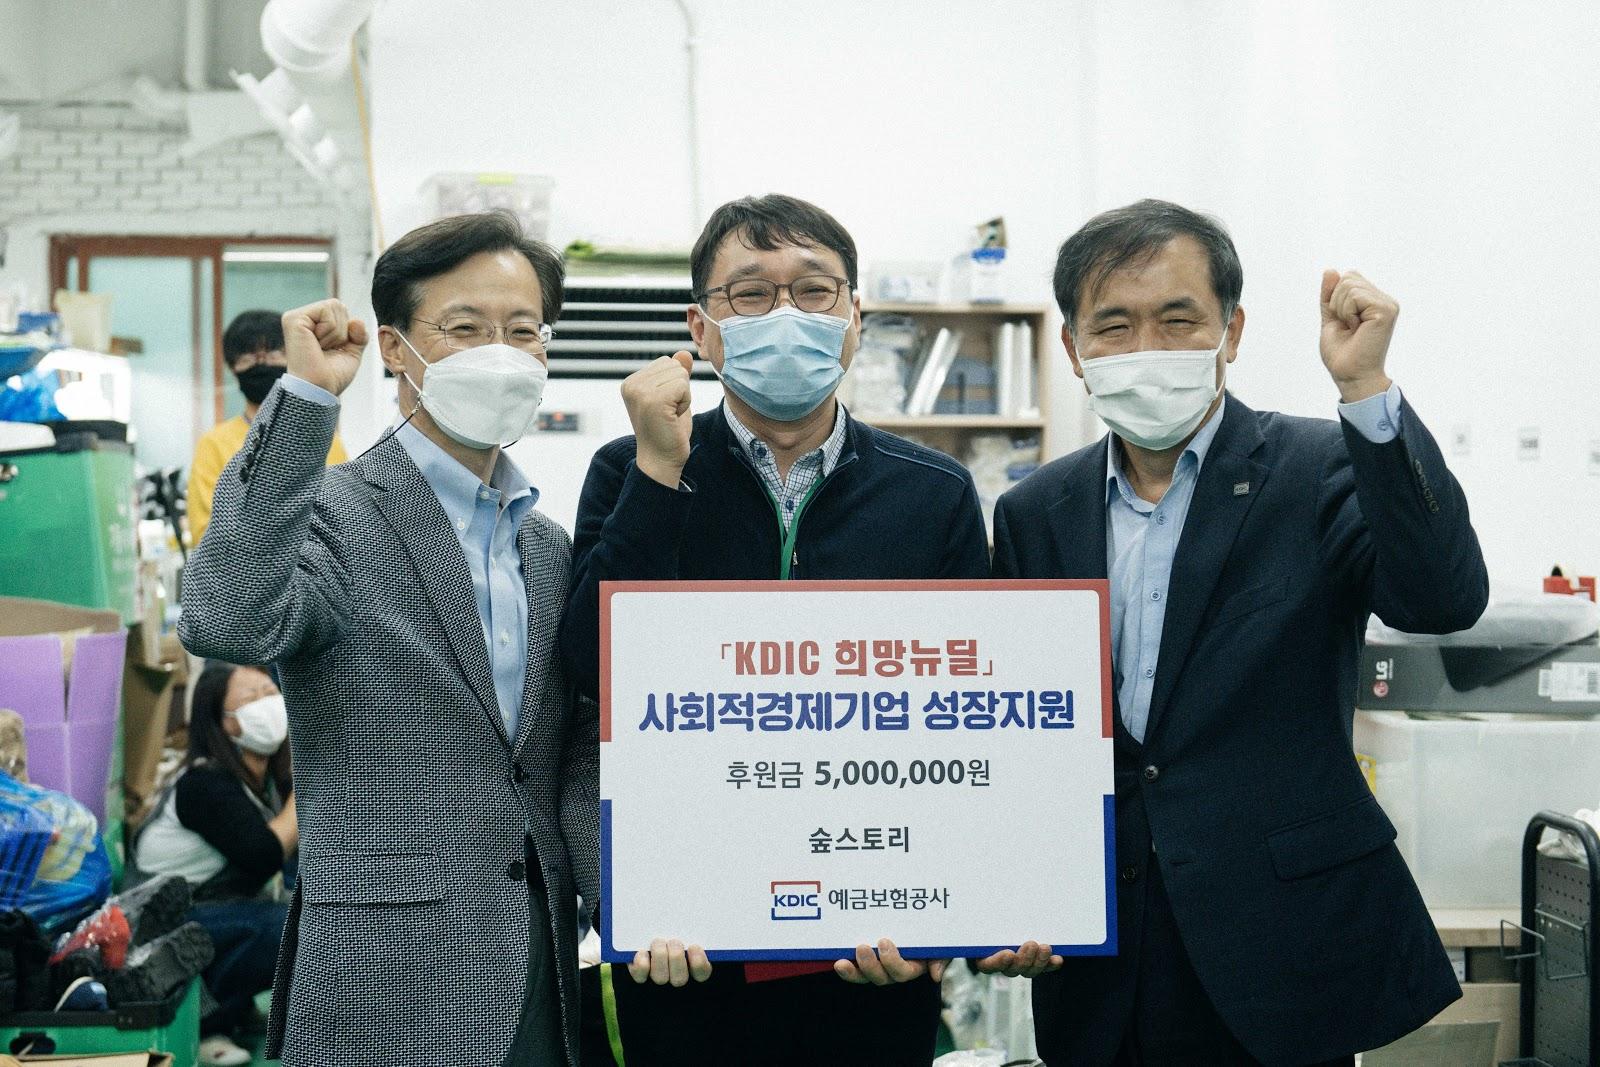 'KDIC 희망뉴딜' 사회적경제기업 성장지원 지원금 전달 후 기념사진 촬영(맨왼쪽부터 나석권 원장, 김경호 대표, 위성백 사장)하는 사진